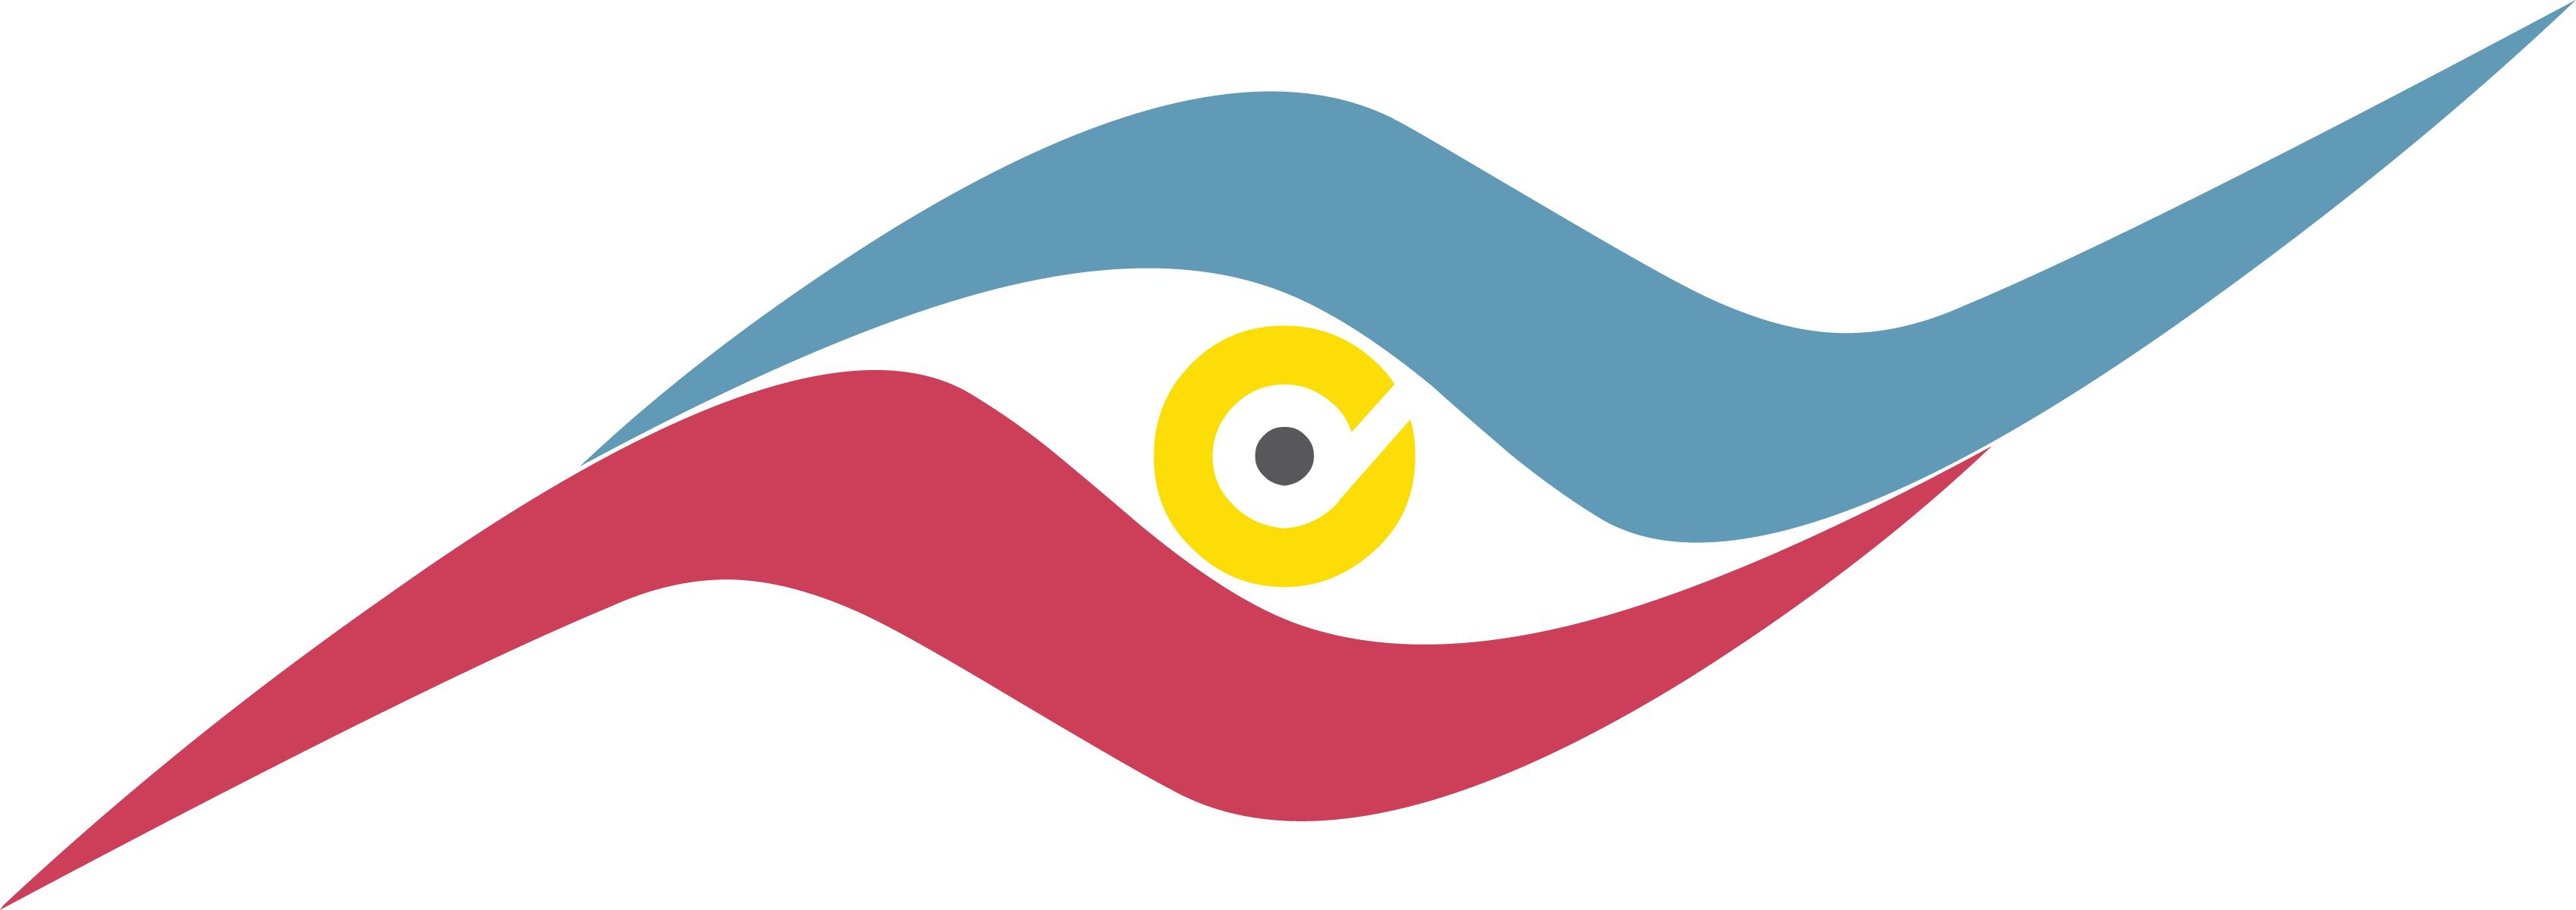 Eyeonline.tv: Bert Sohl